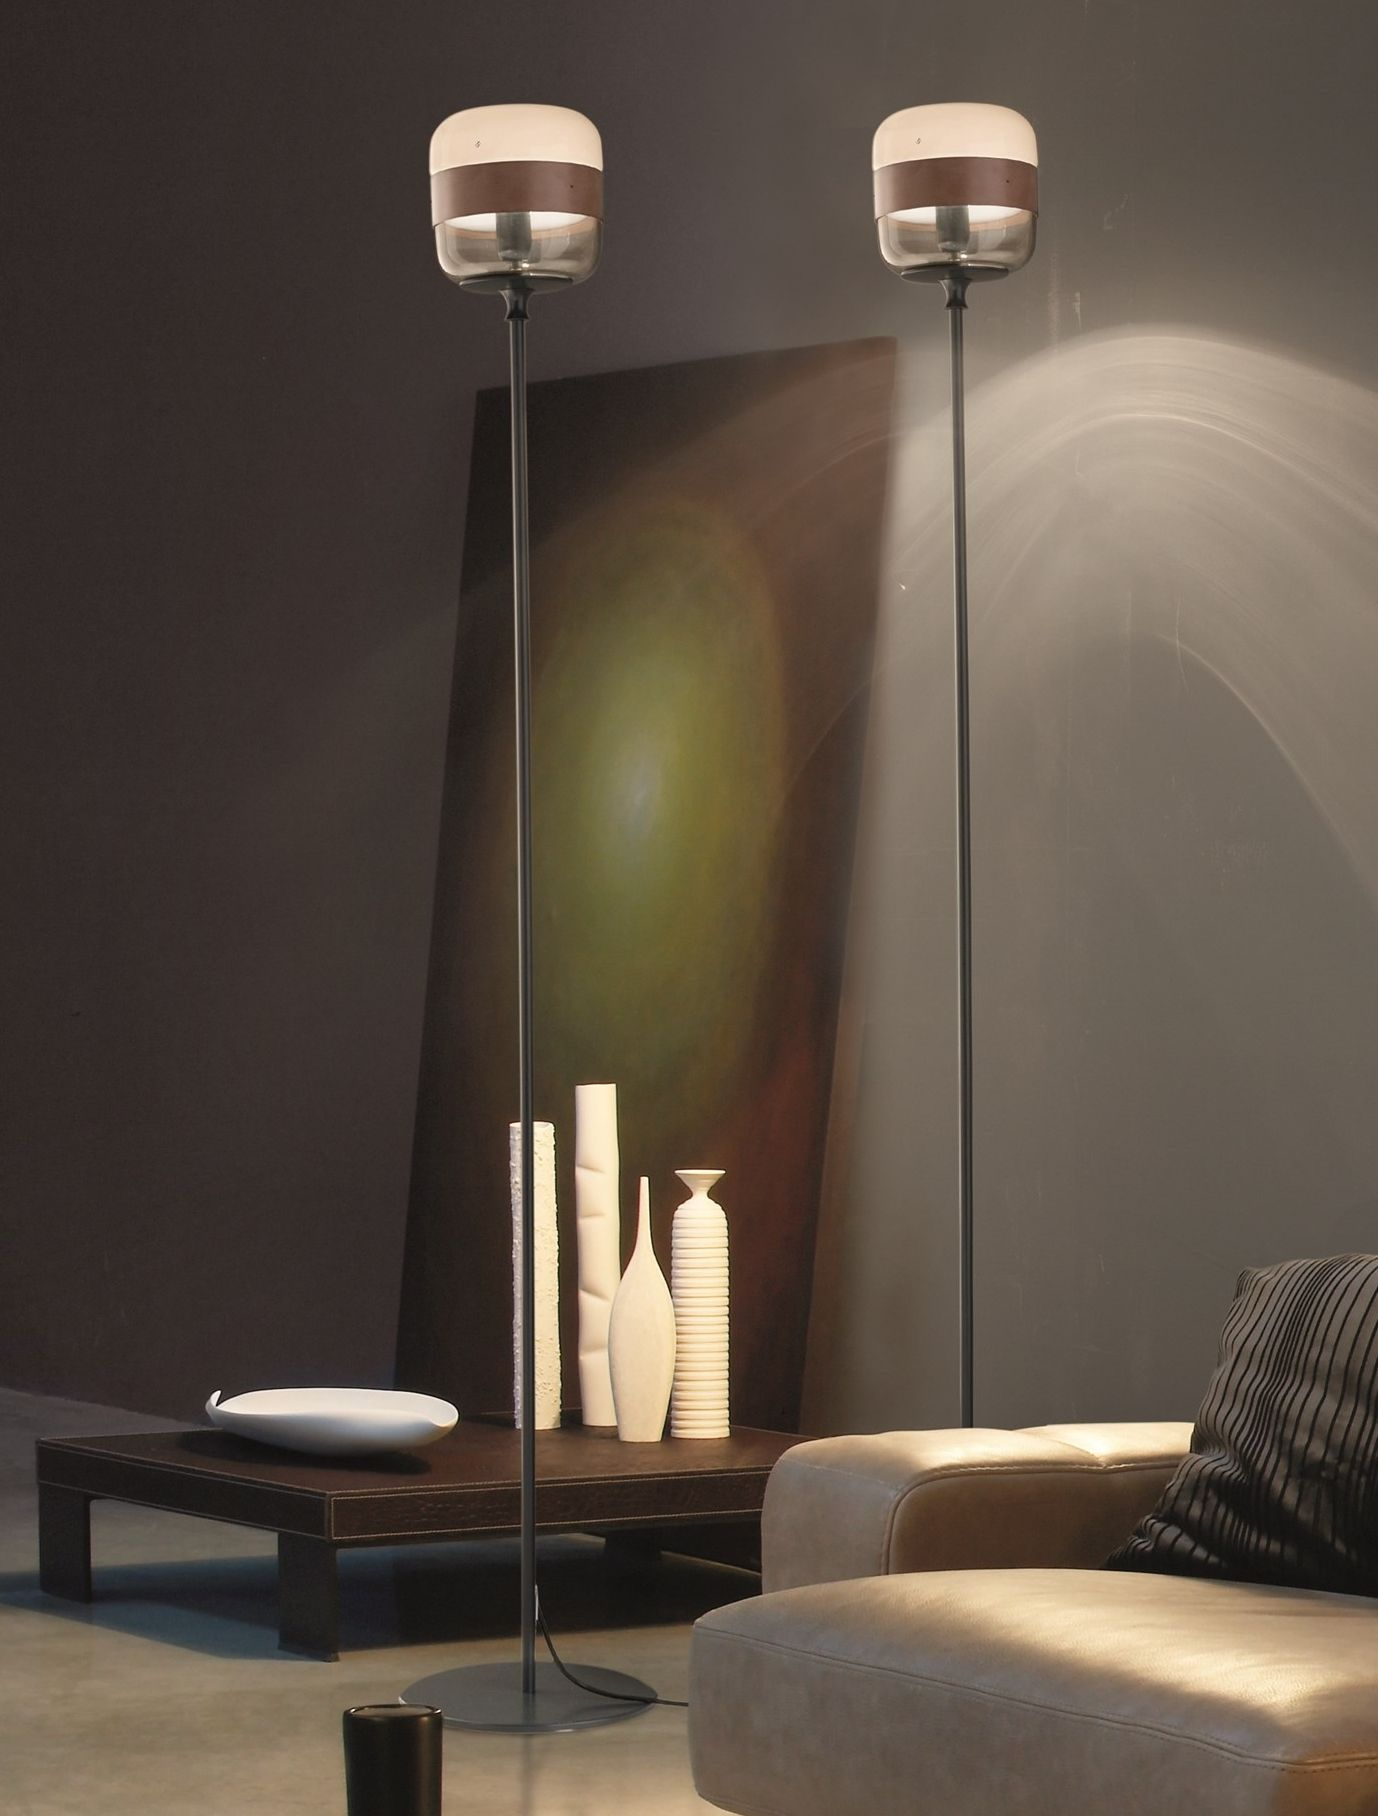 Direct Indirect Light Blown Glass Floor Lamp Futura Pt Futura Collection By Vetreria Vistosi Design Hangar Design Group Glass Floor Lamp Floor Lamp Design Glass Floor